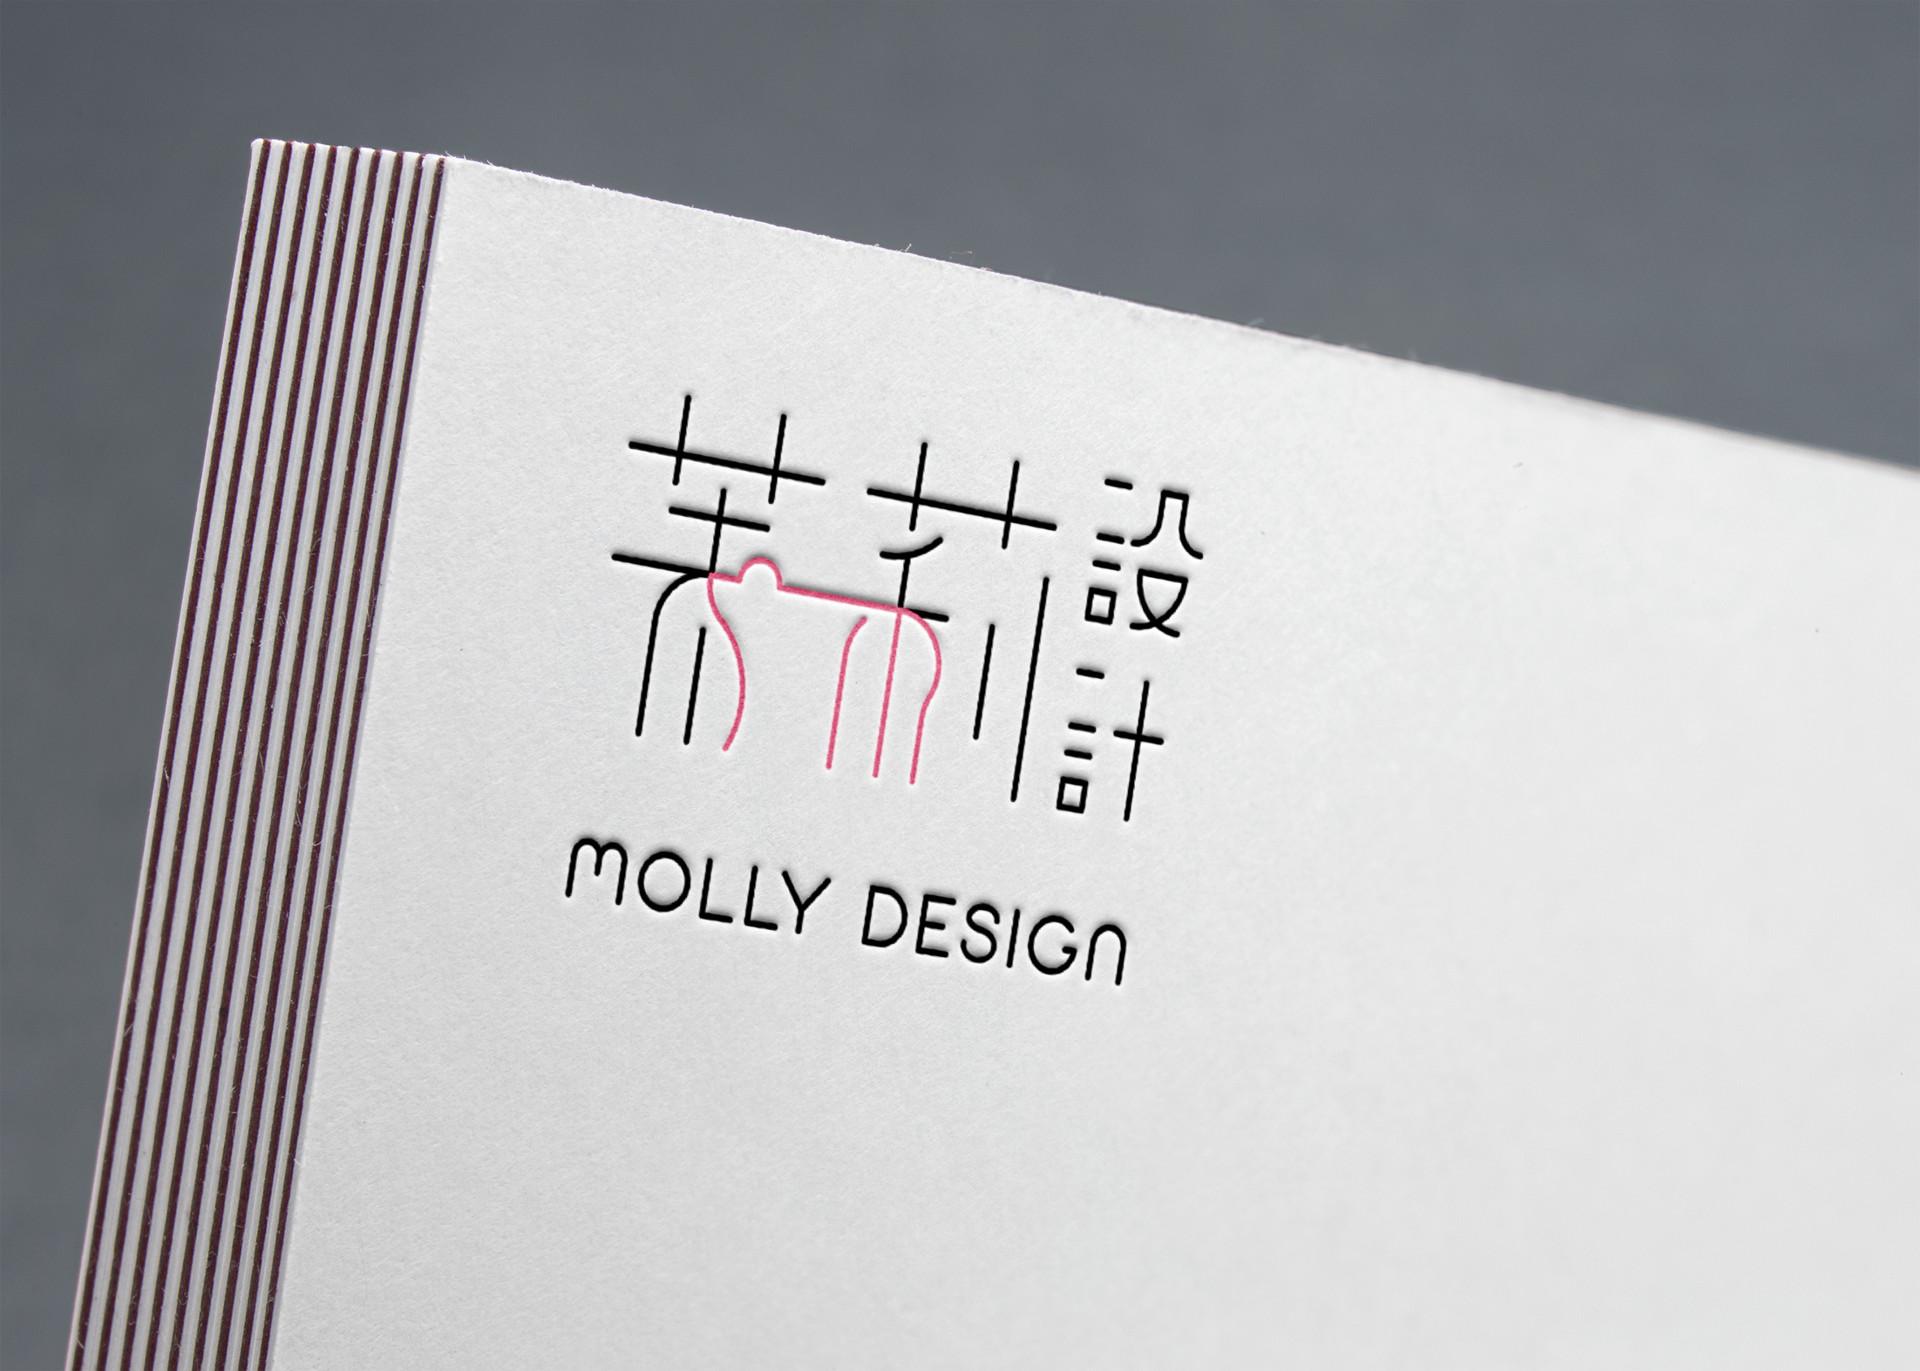 molly design 2.jpg